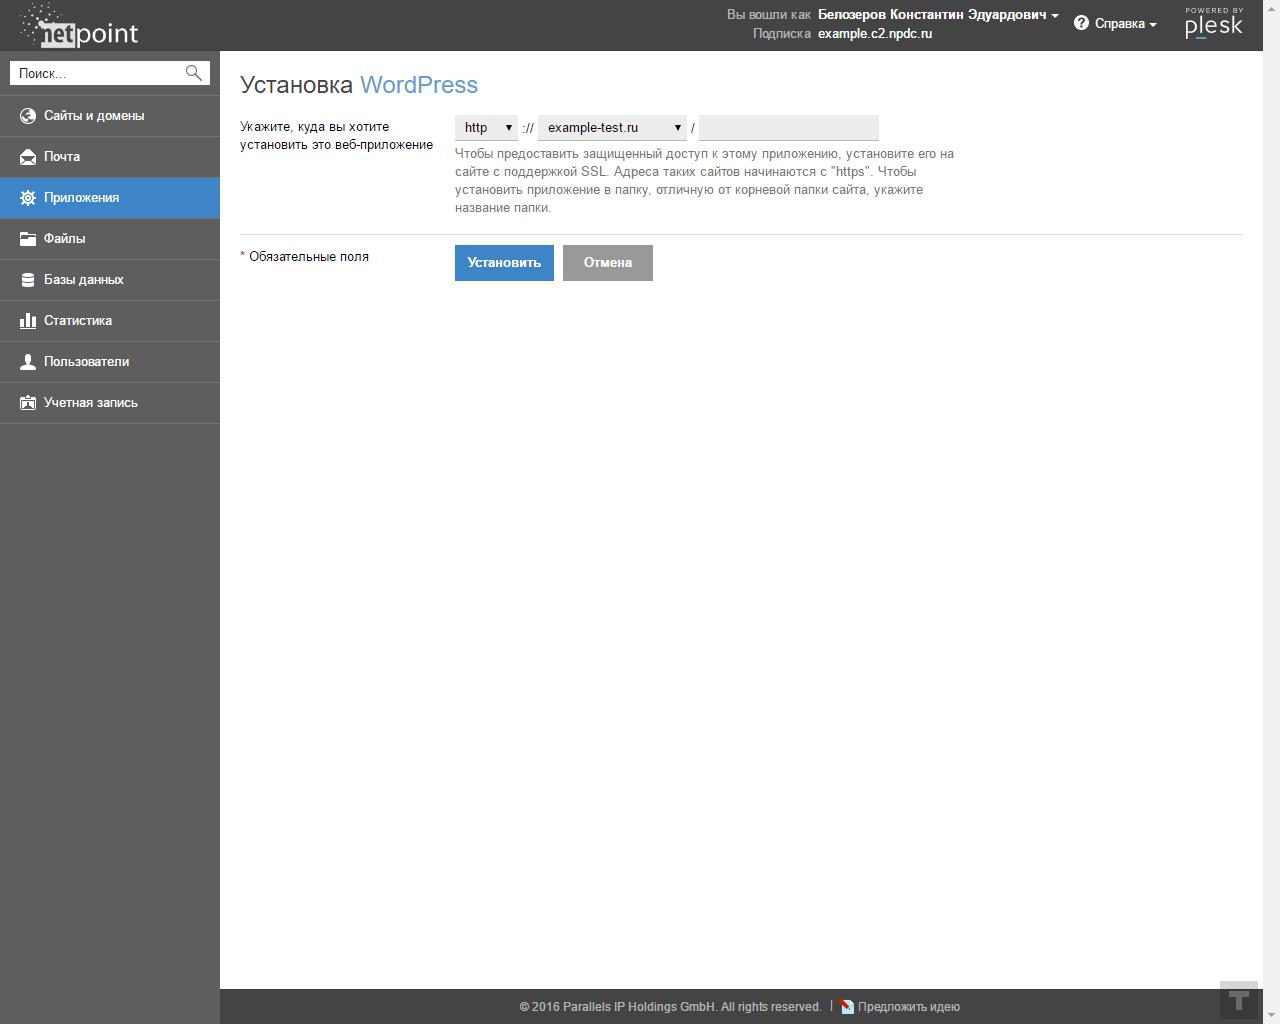 Выбор домена для установки WordPress